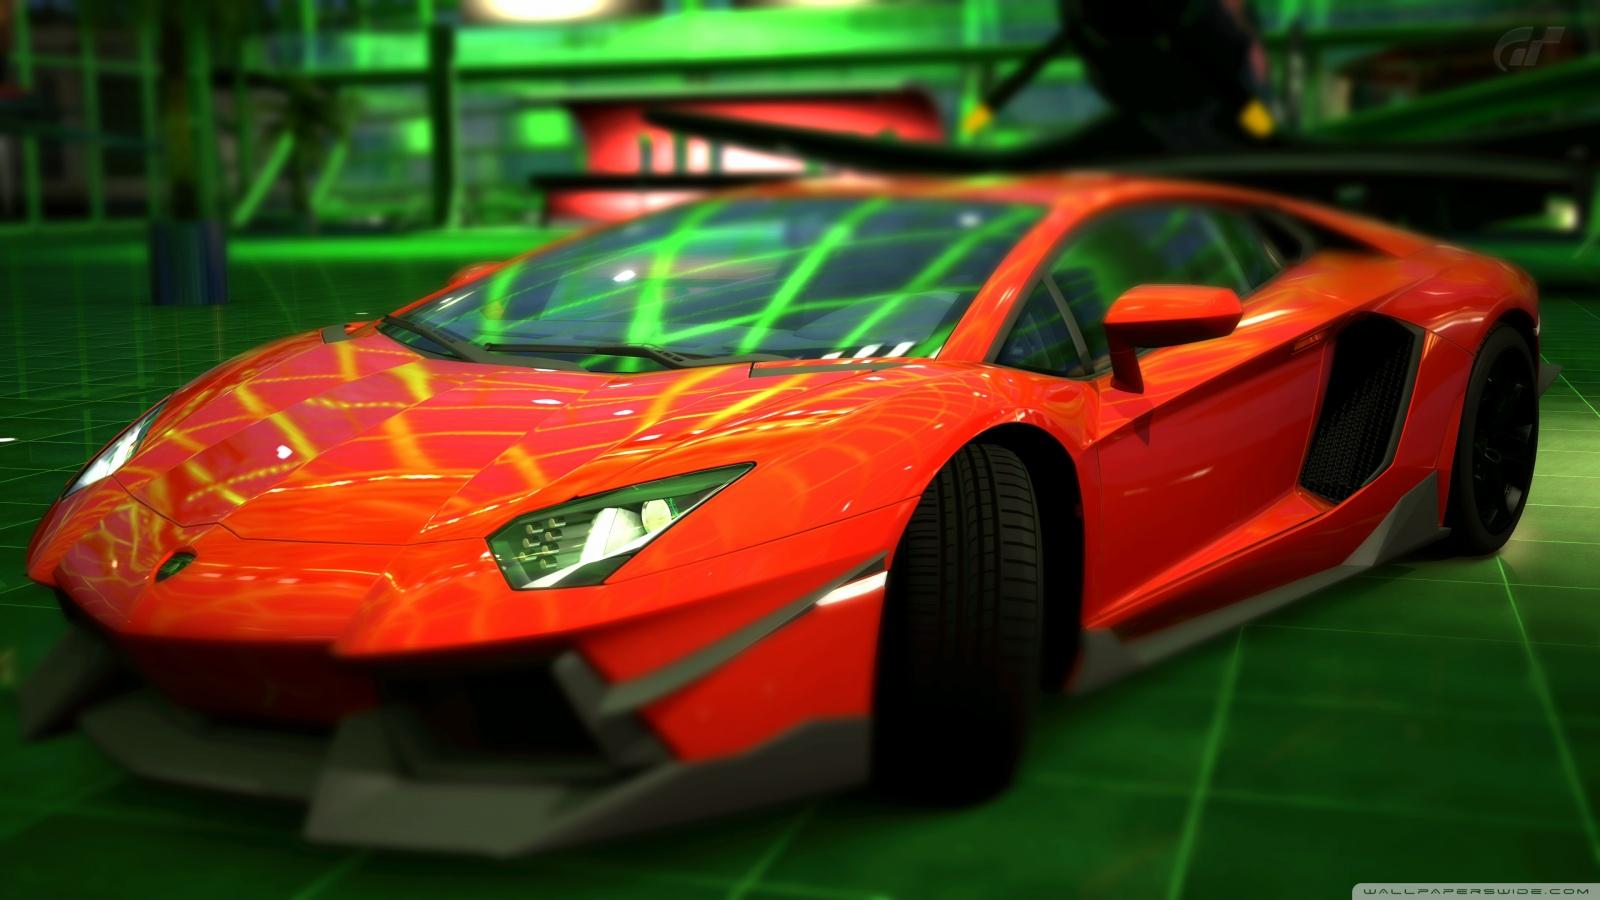 Lamborghini Aventador Cars Wallpapers Lamborghini Aventador Lp700 4 Red 4k Hd Desktop Wallpaper